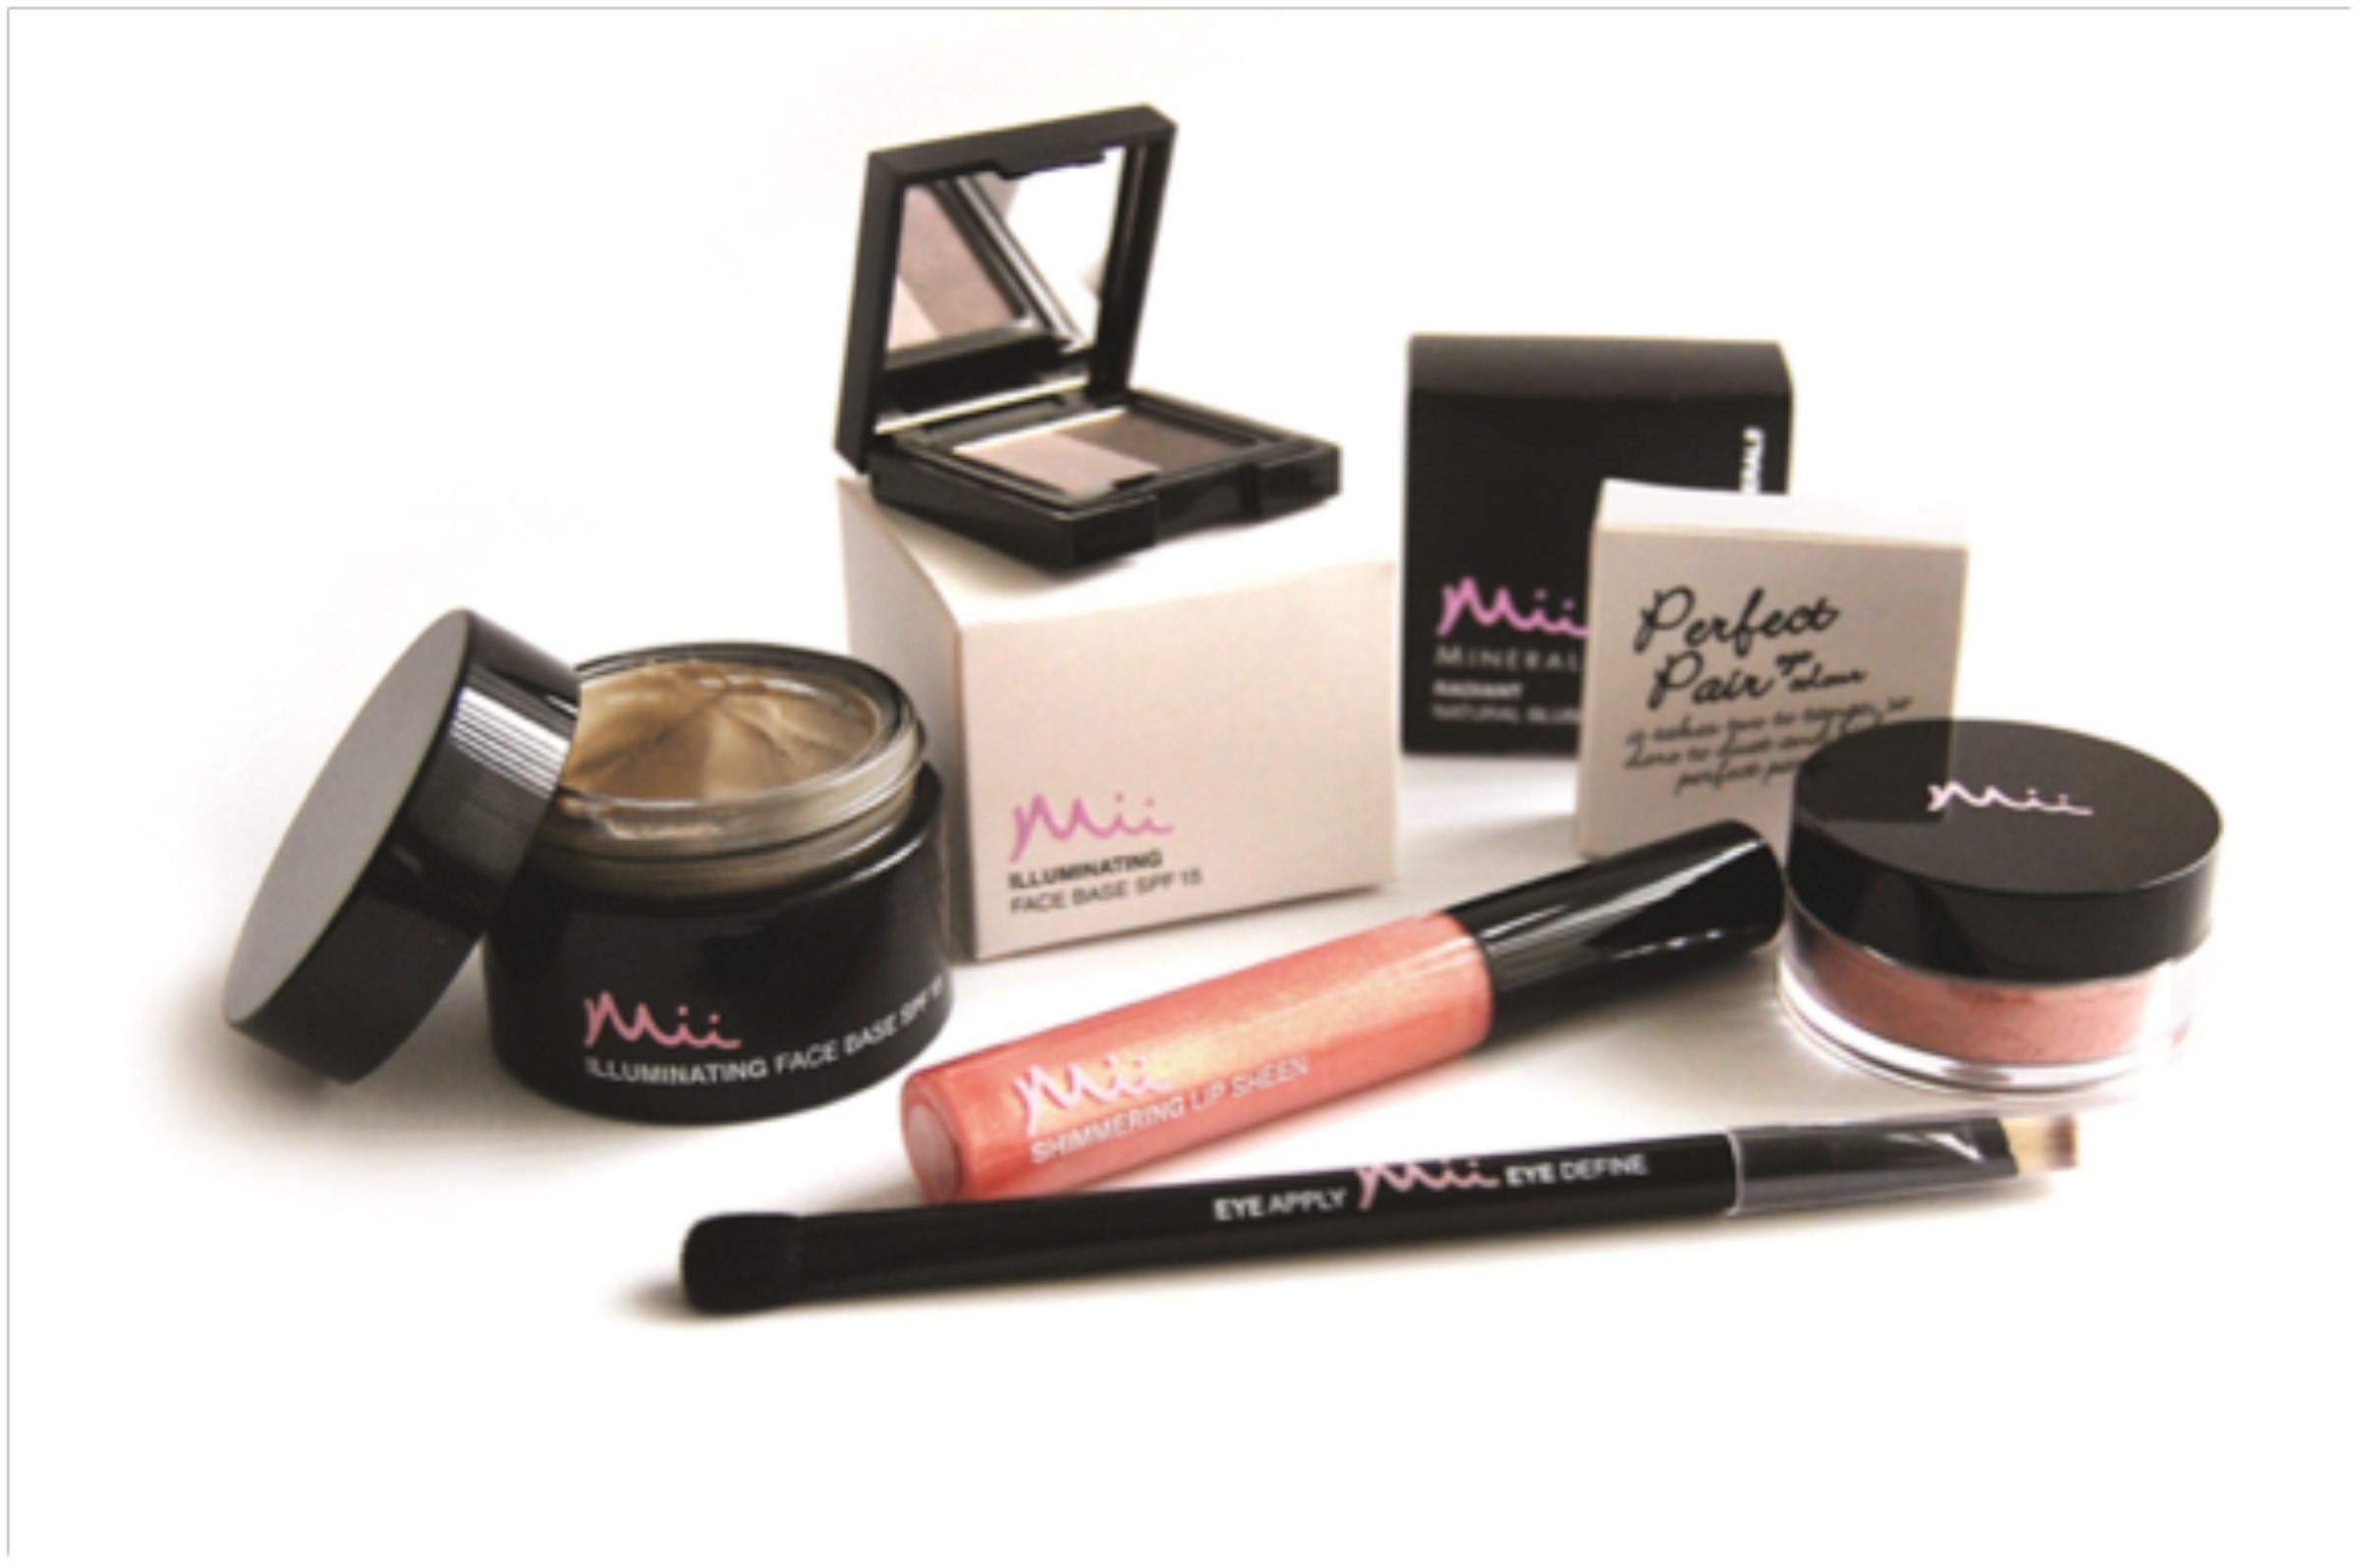 Free Mii make-up offer